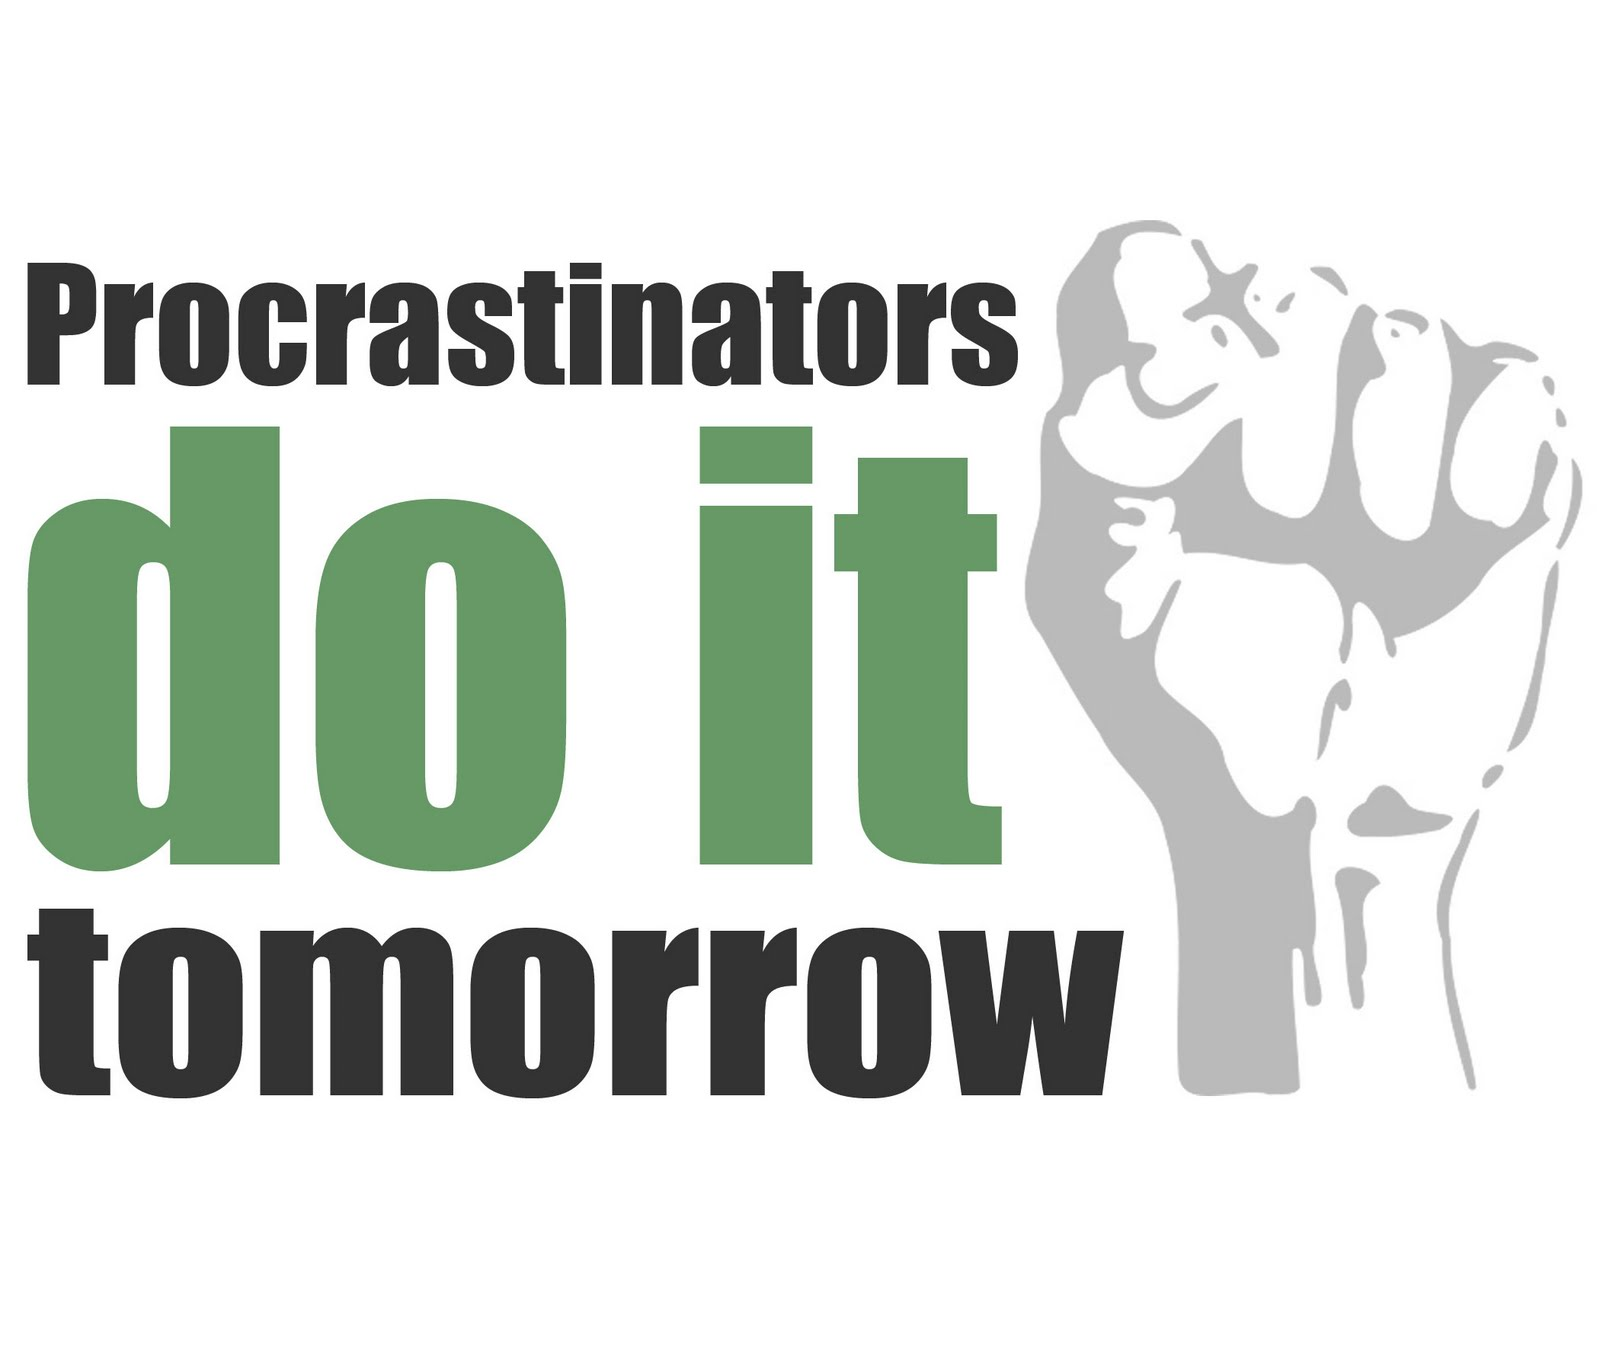 alamode Stuff: Hello, I'm a procrastinator